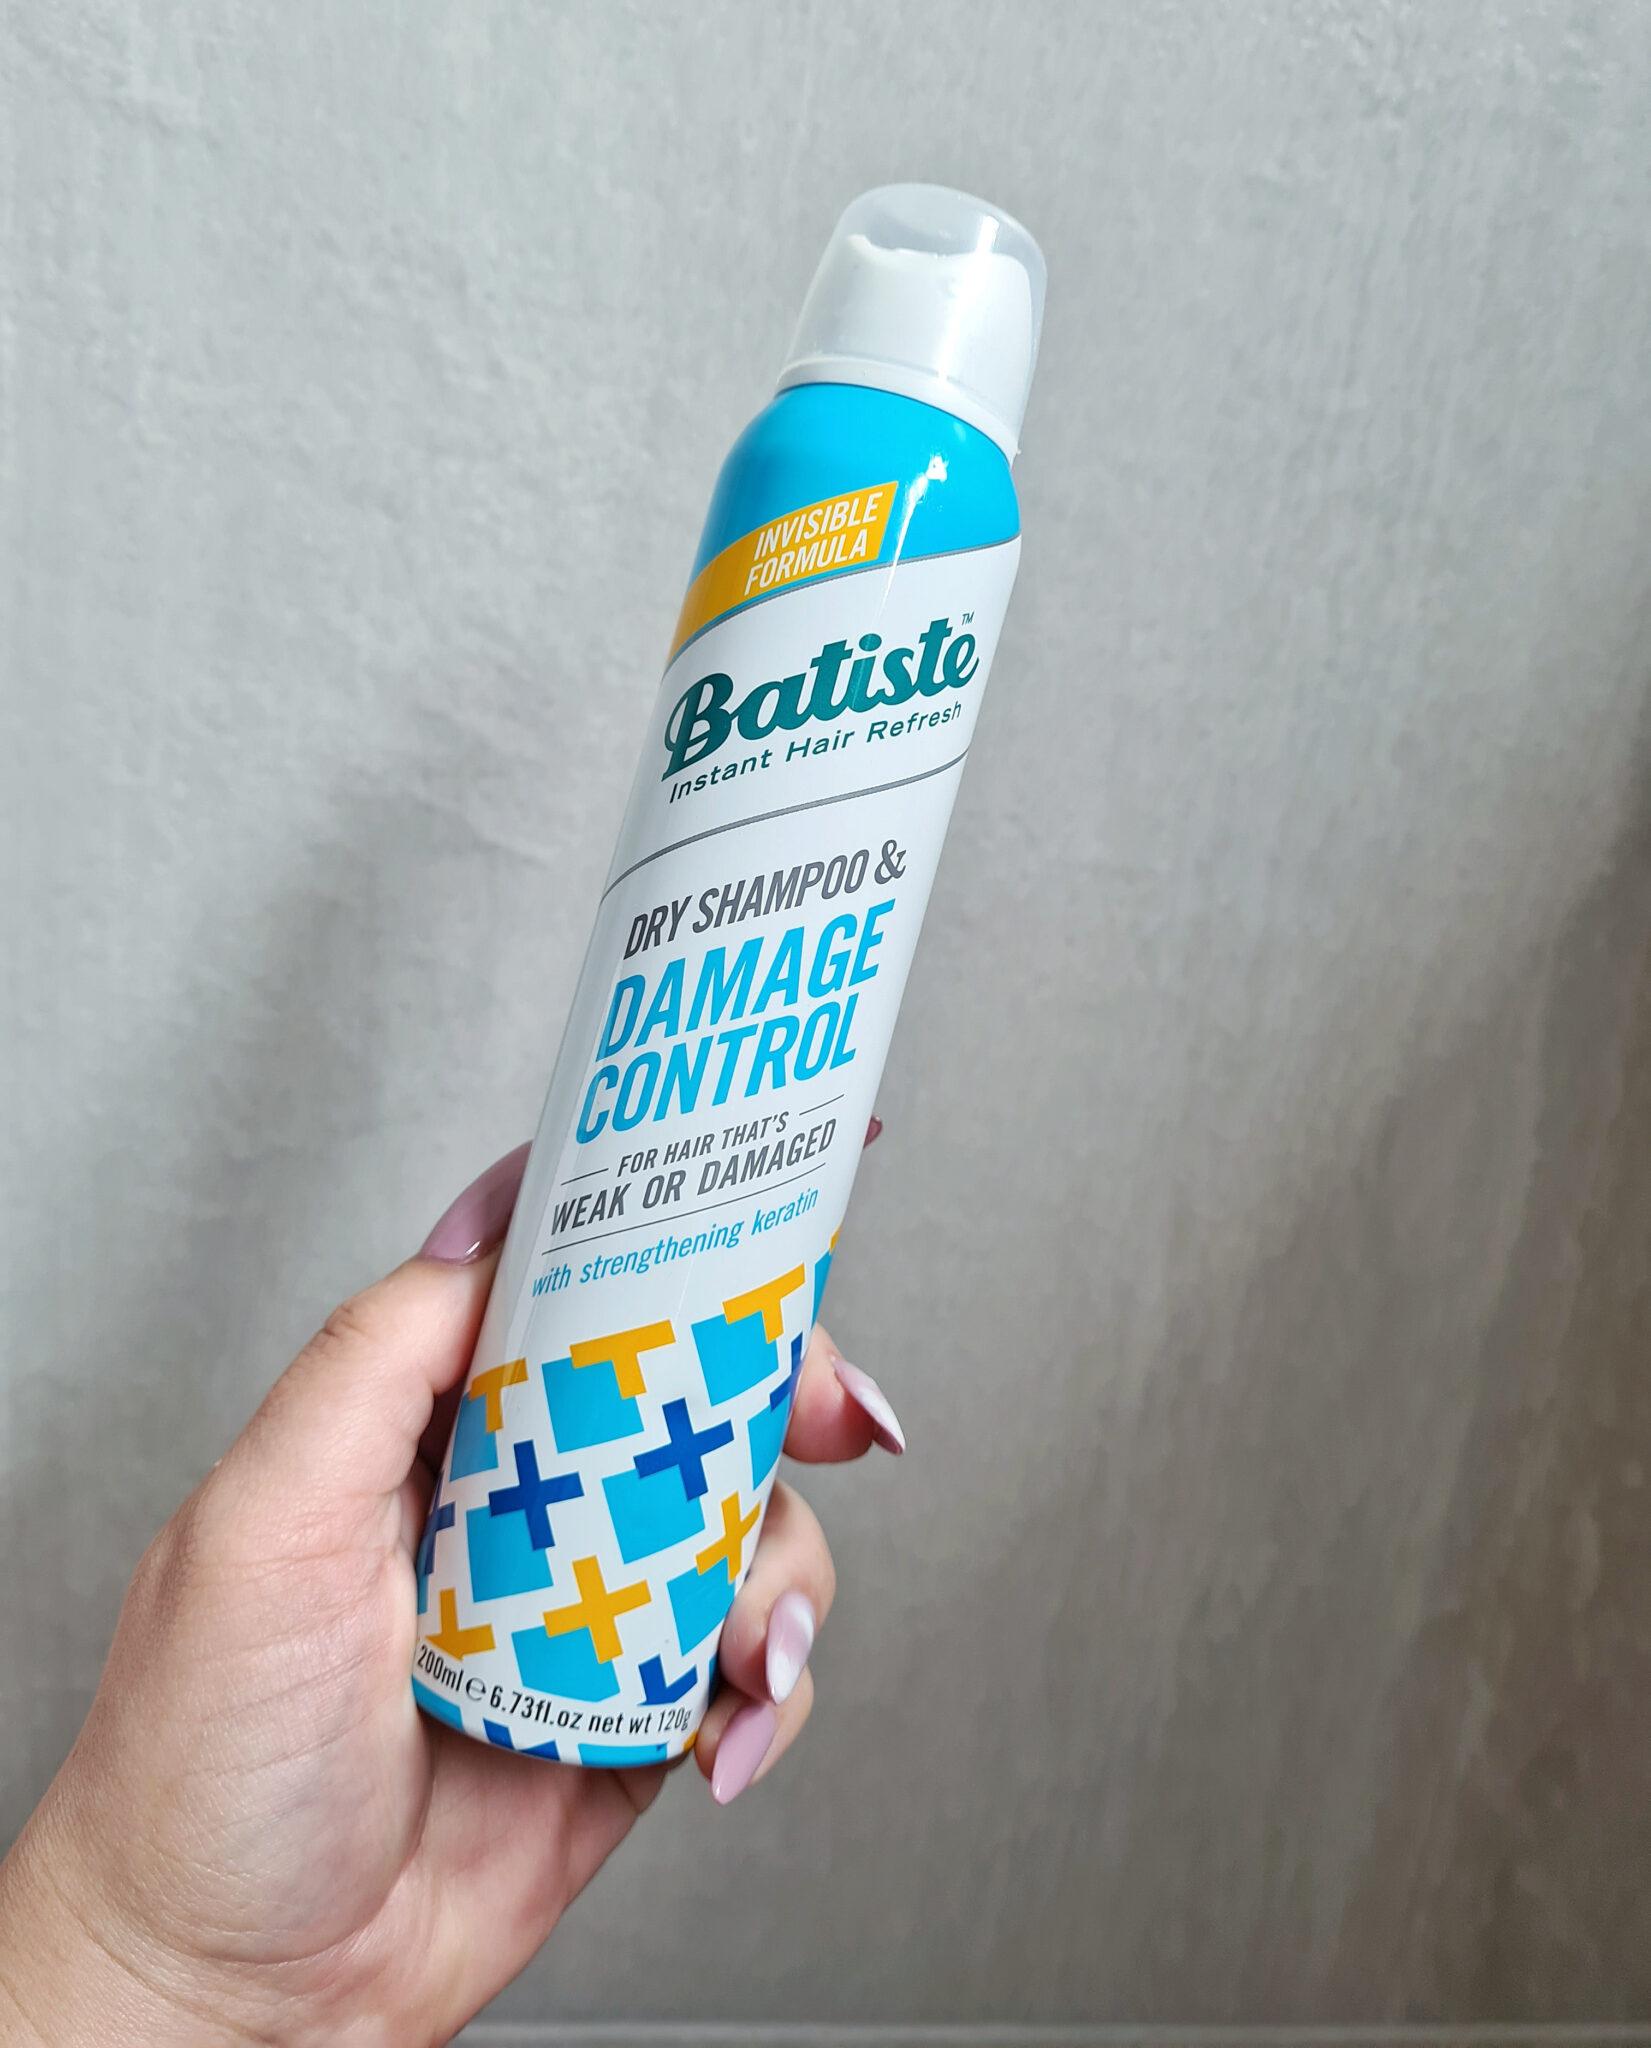 BATISTE DAMAGE CONTROL DRY SHAMPOO